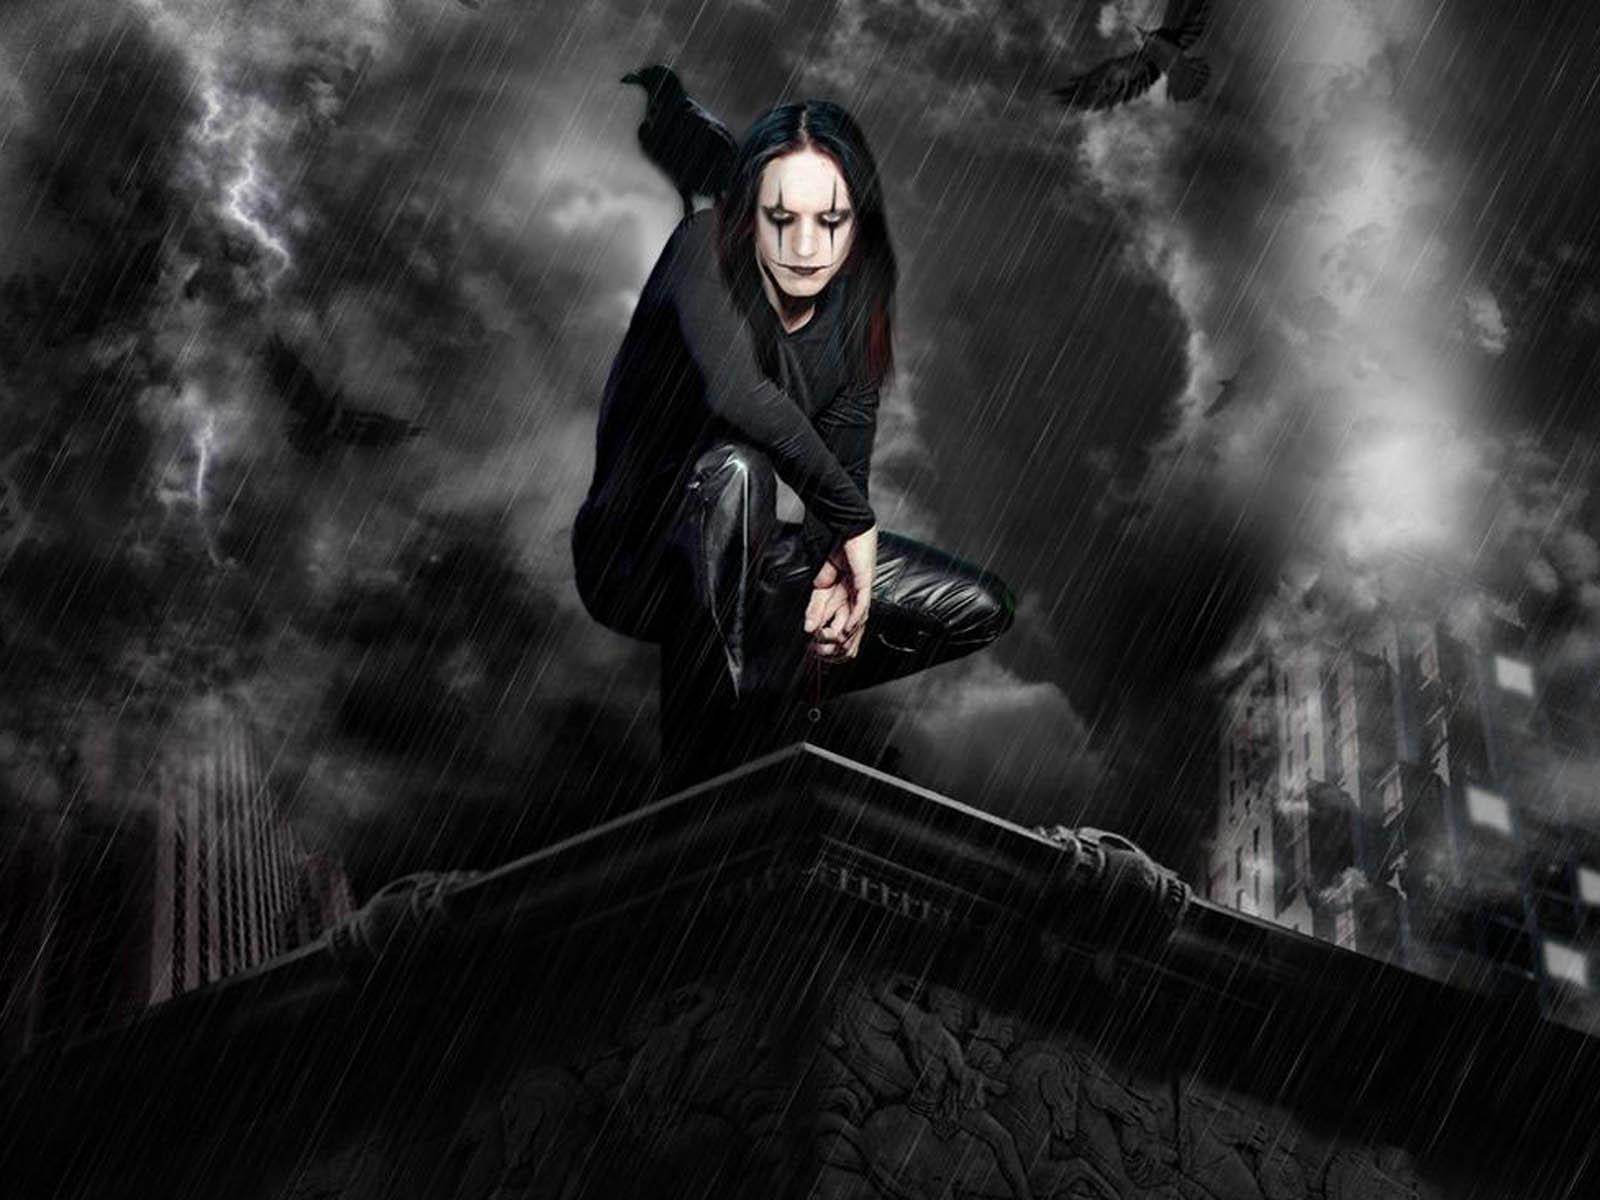 Dark Gothic Wallpaperswallpapers screensavers 1600x1200